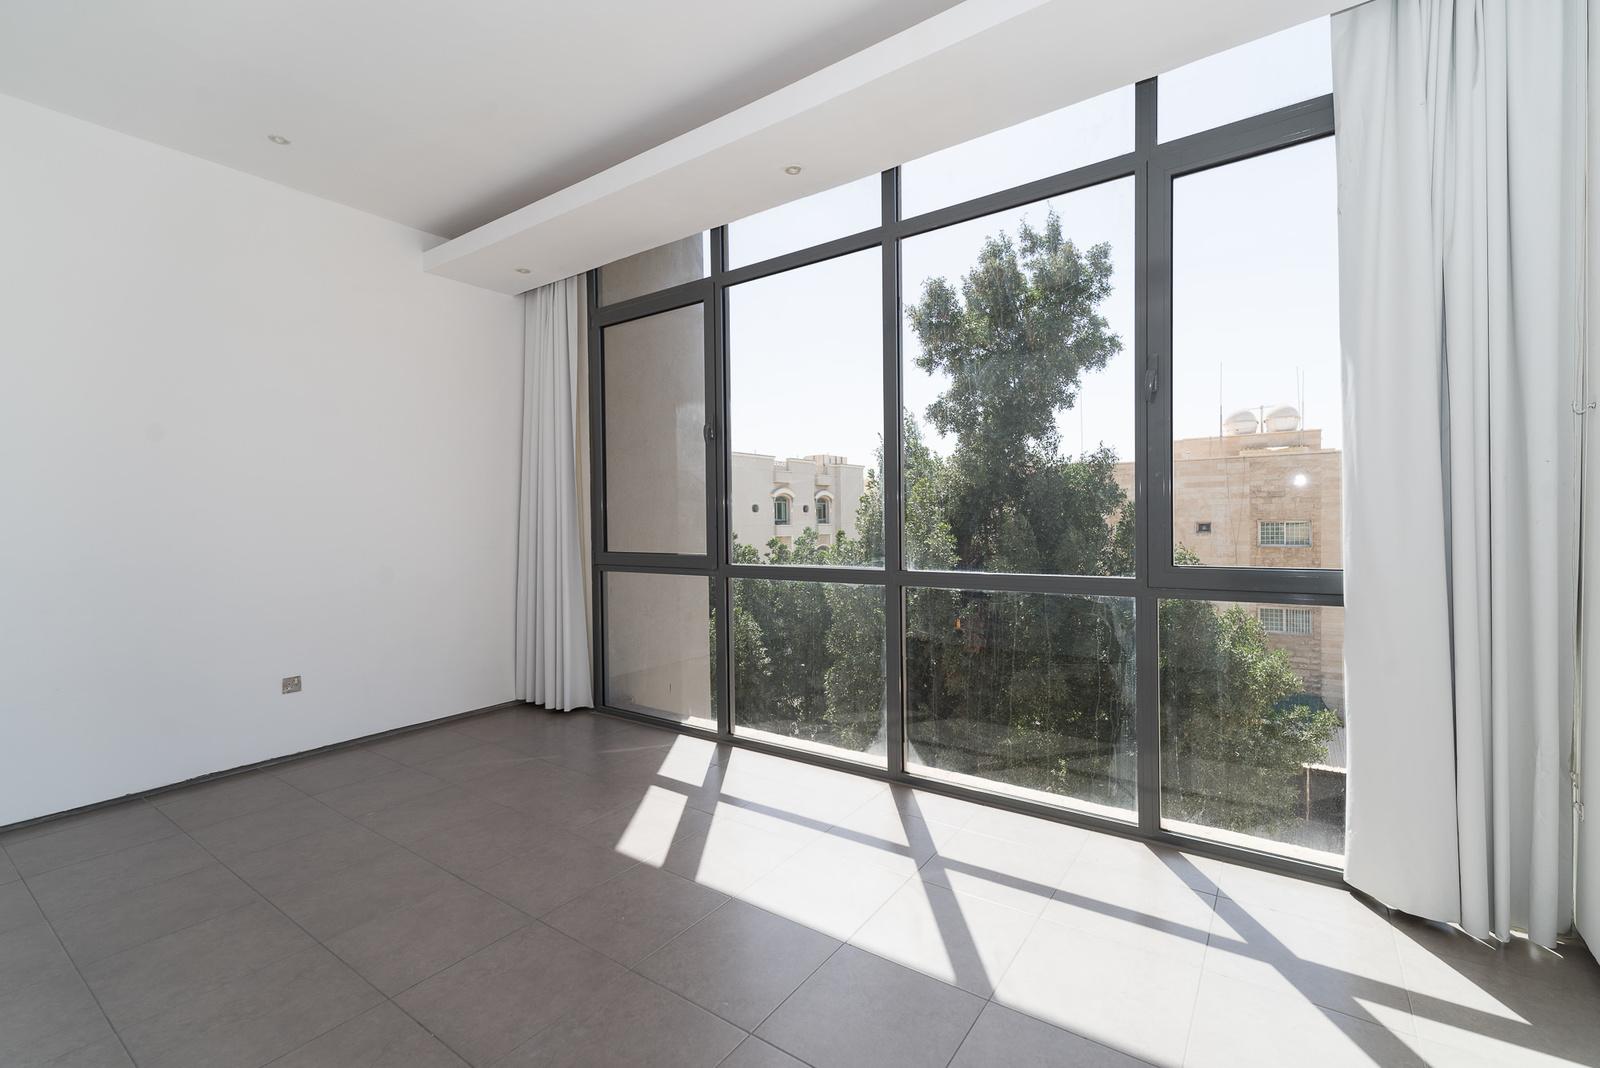 Salwa – great, sunny, unfurnished three bedroom apartment w/pool